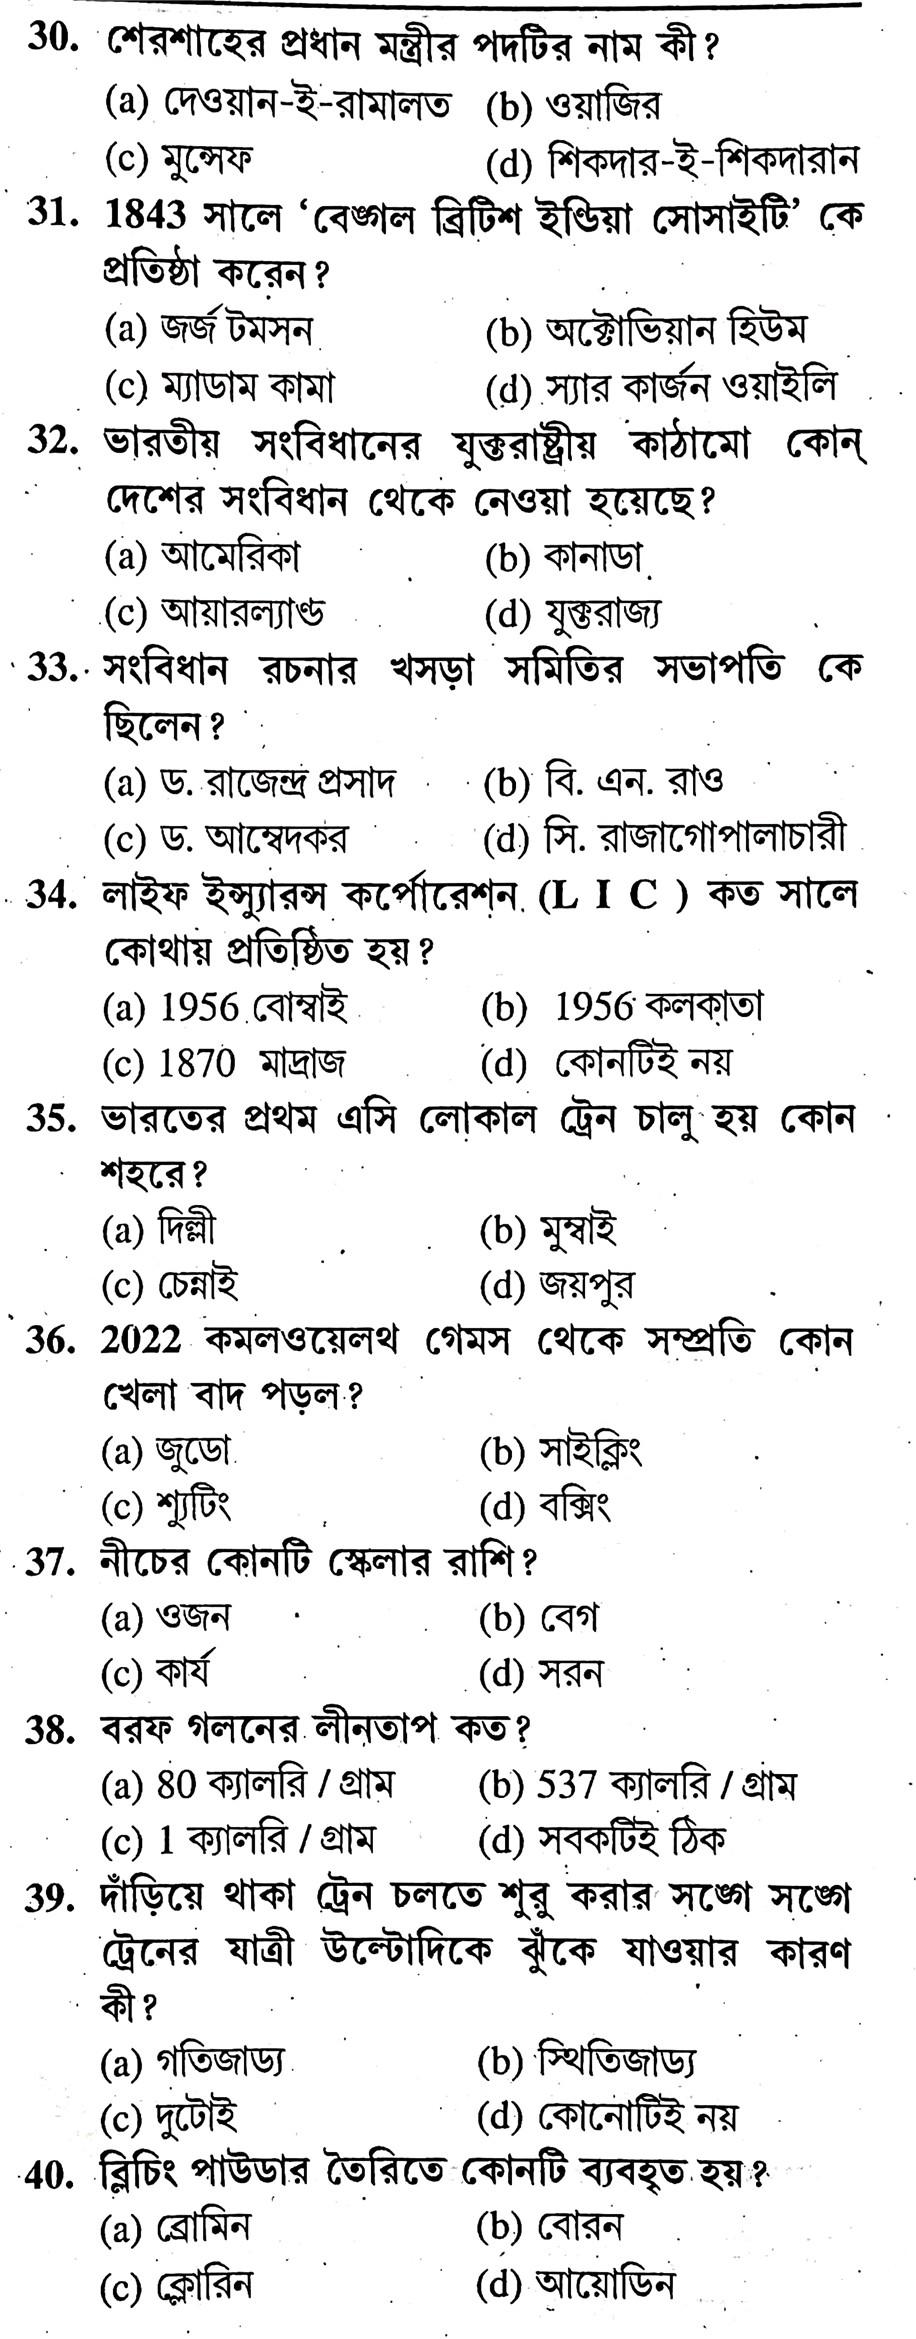 West Bengal Police Constable Preliminary Practice Set - 12 In Bengali || পশ্চিমবঙ্গ পুলিশ কনস্টেবল প্রিলিমিনারী প্র্যাকটিস সেট -১২ - WBCS Notebook